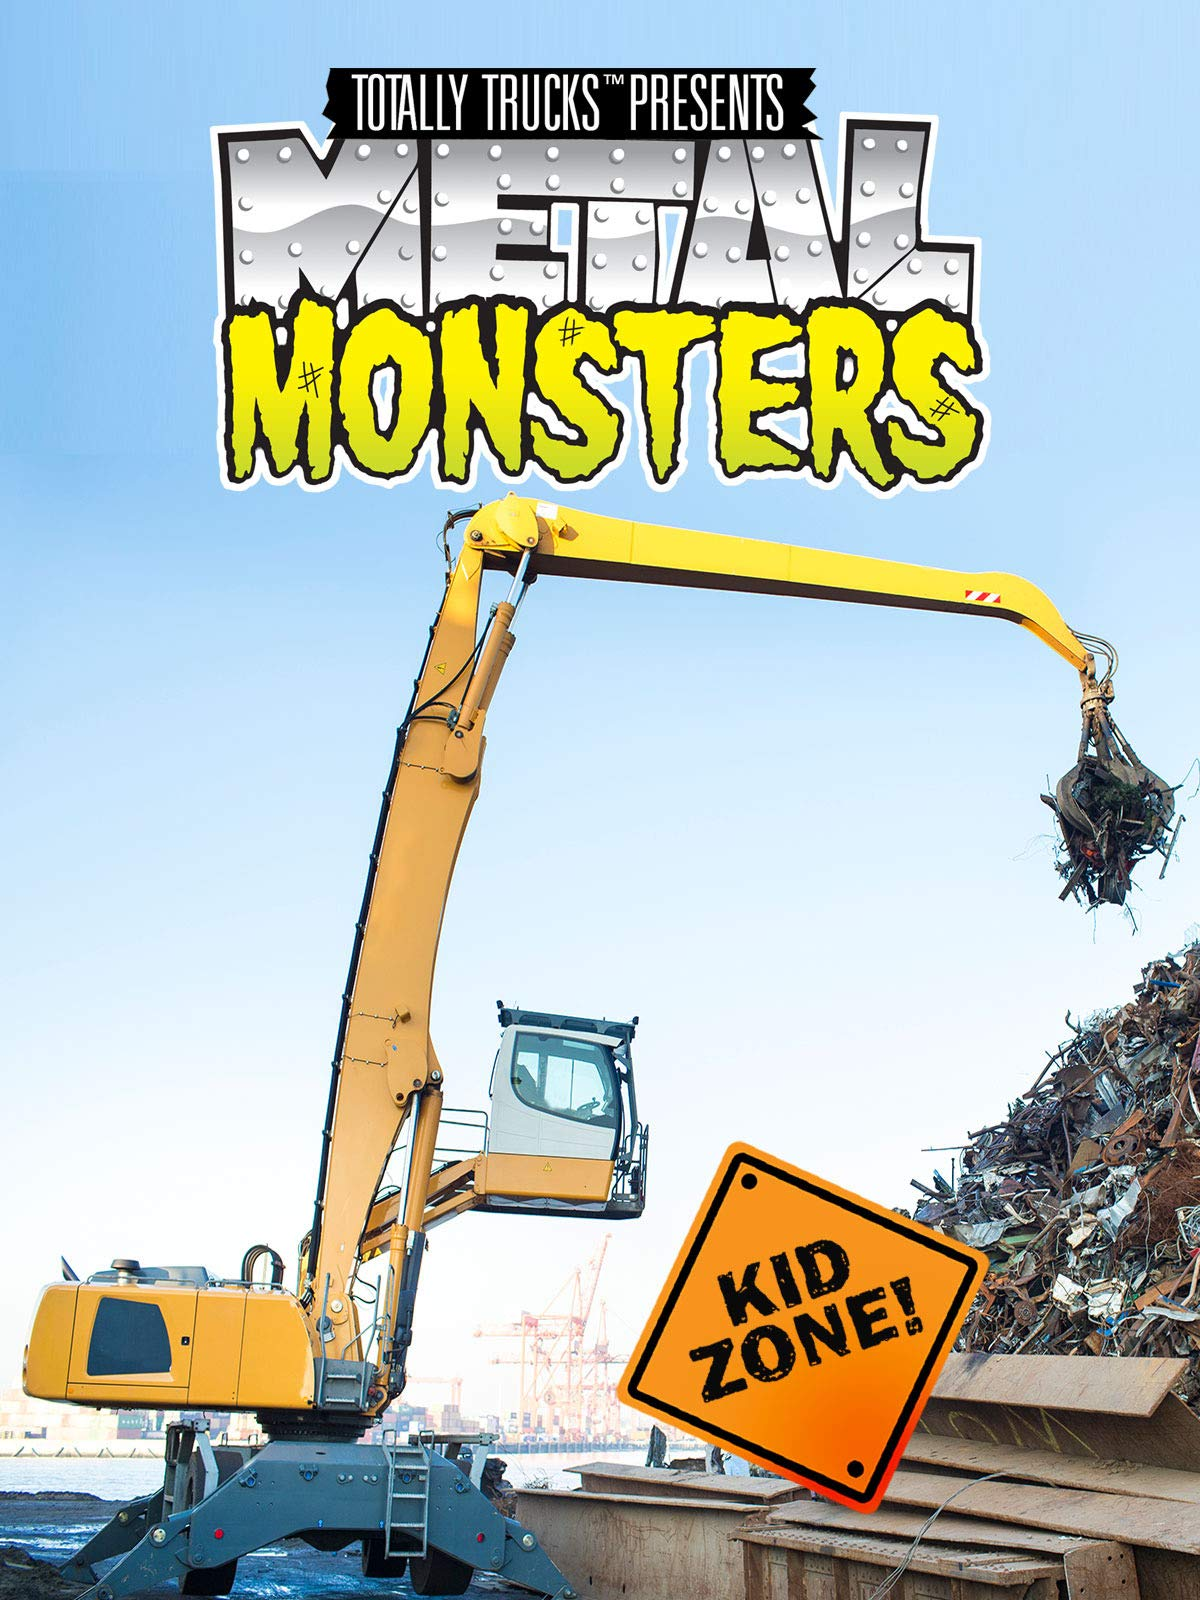 Totally Trucks - Metal Monsters on Amazon Prime Video UK